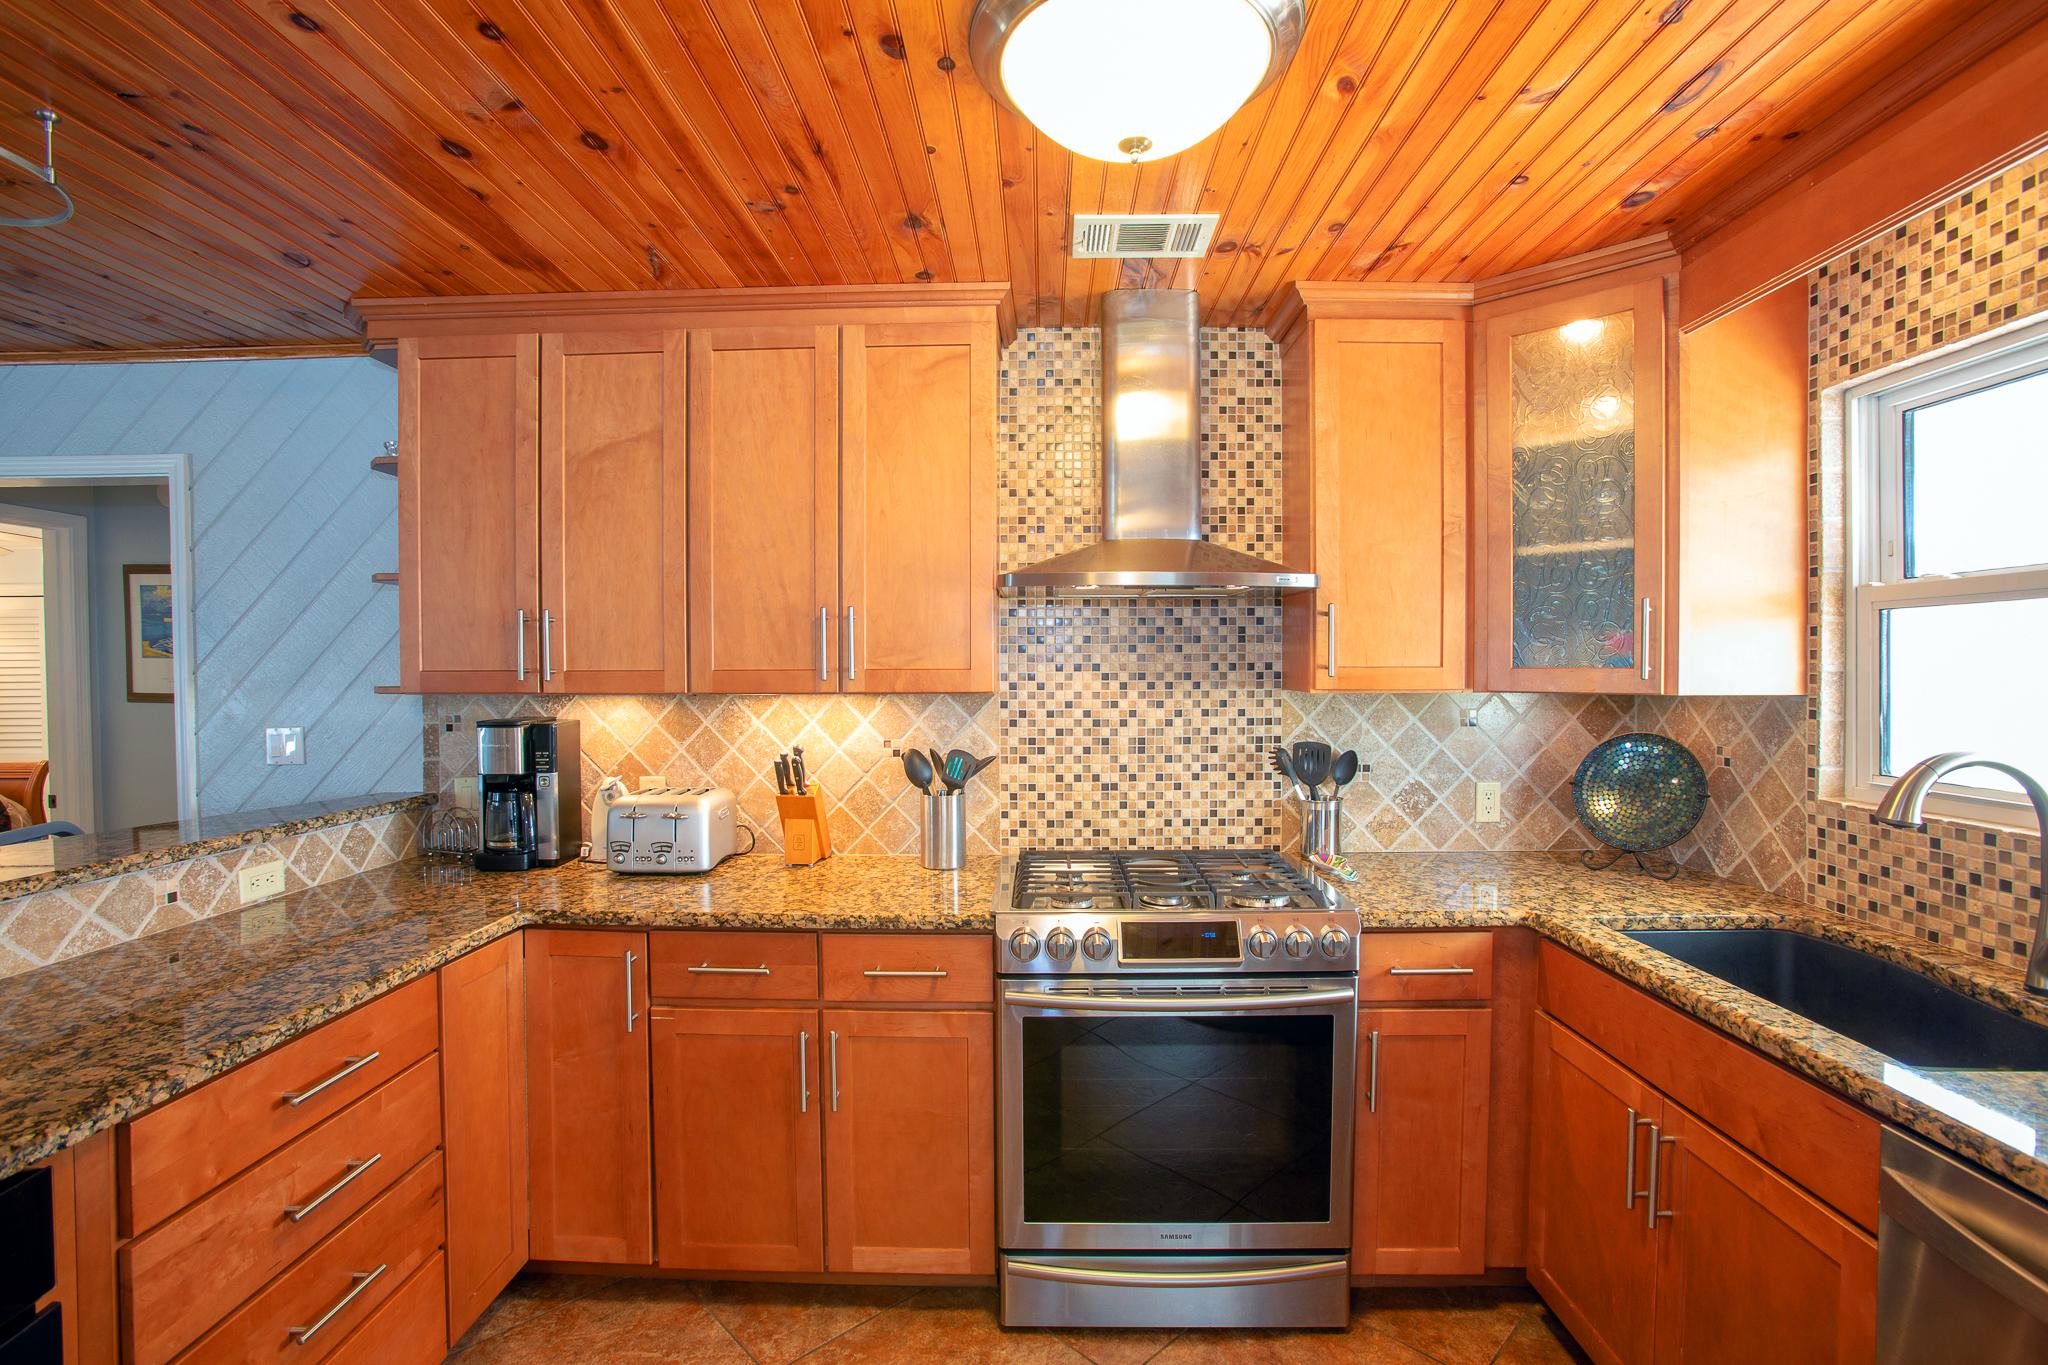 Maldonado 1015 - Sea the Big Picture House/Cottage rental in Pensacola Beach House Rentals in Pensacola Beach Florida - #9